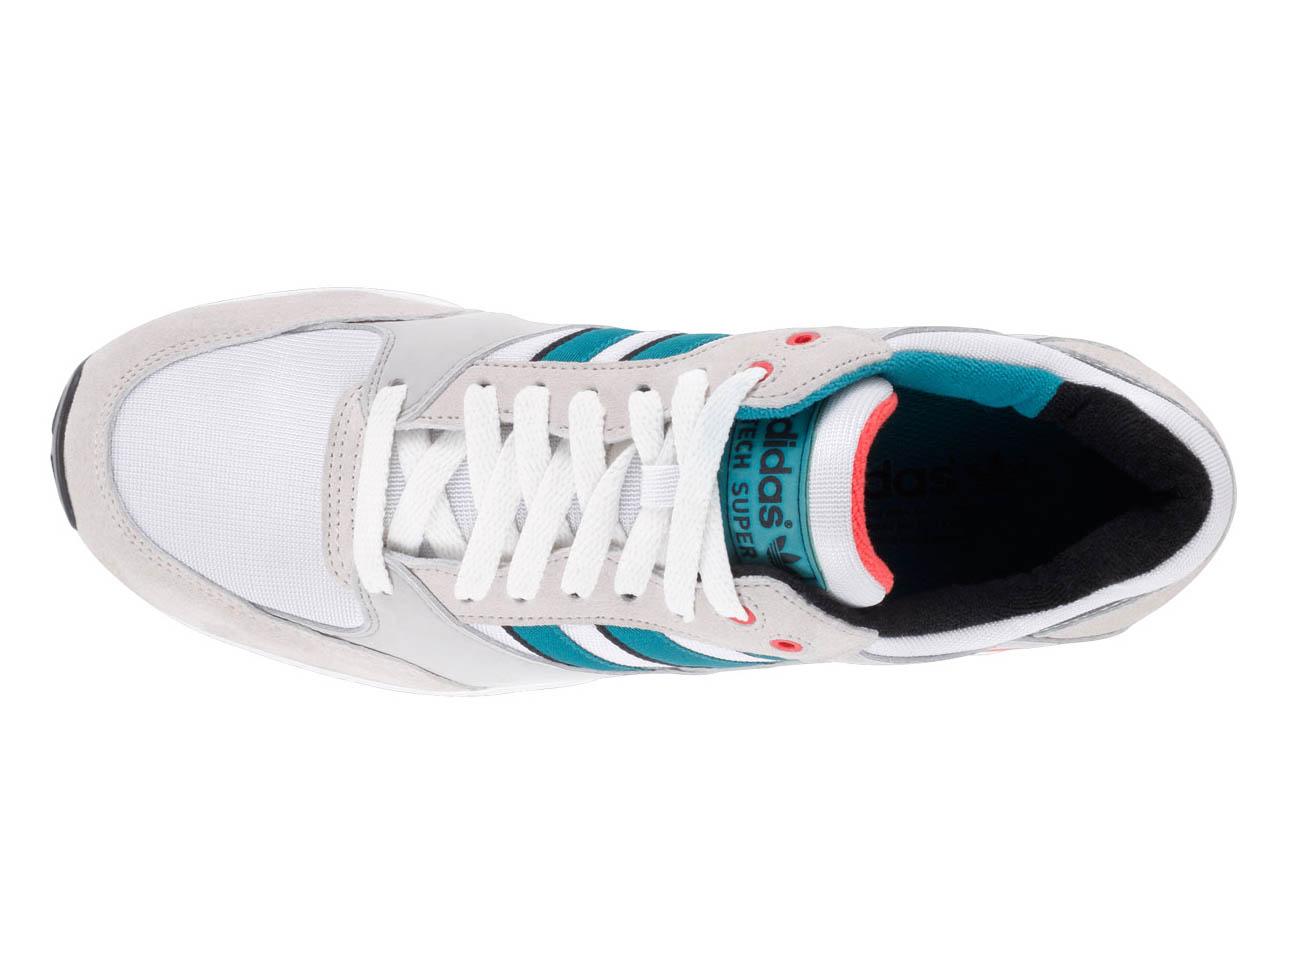 adidas Tech Super  Running White Teal-Red   5a53e6375